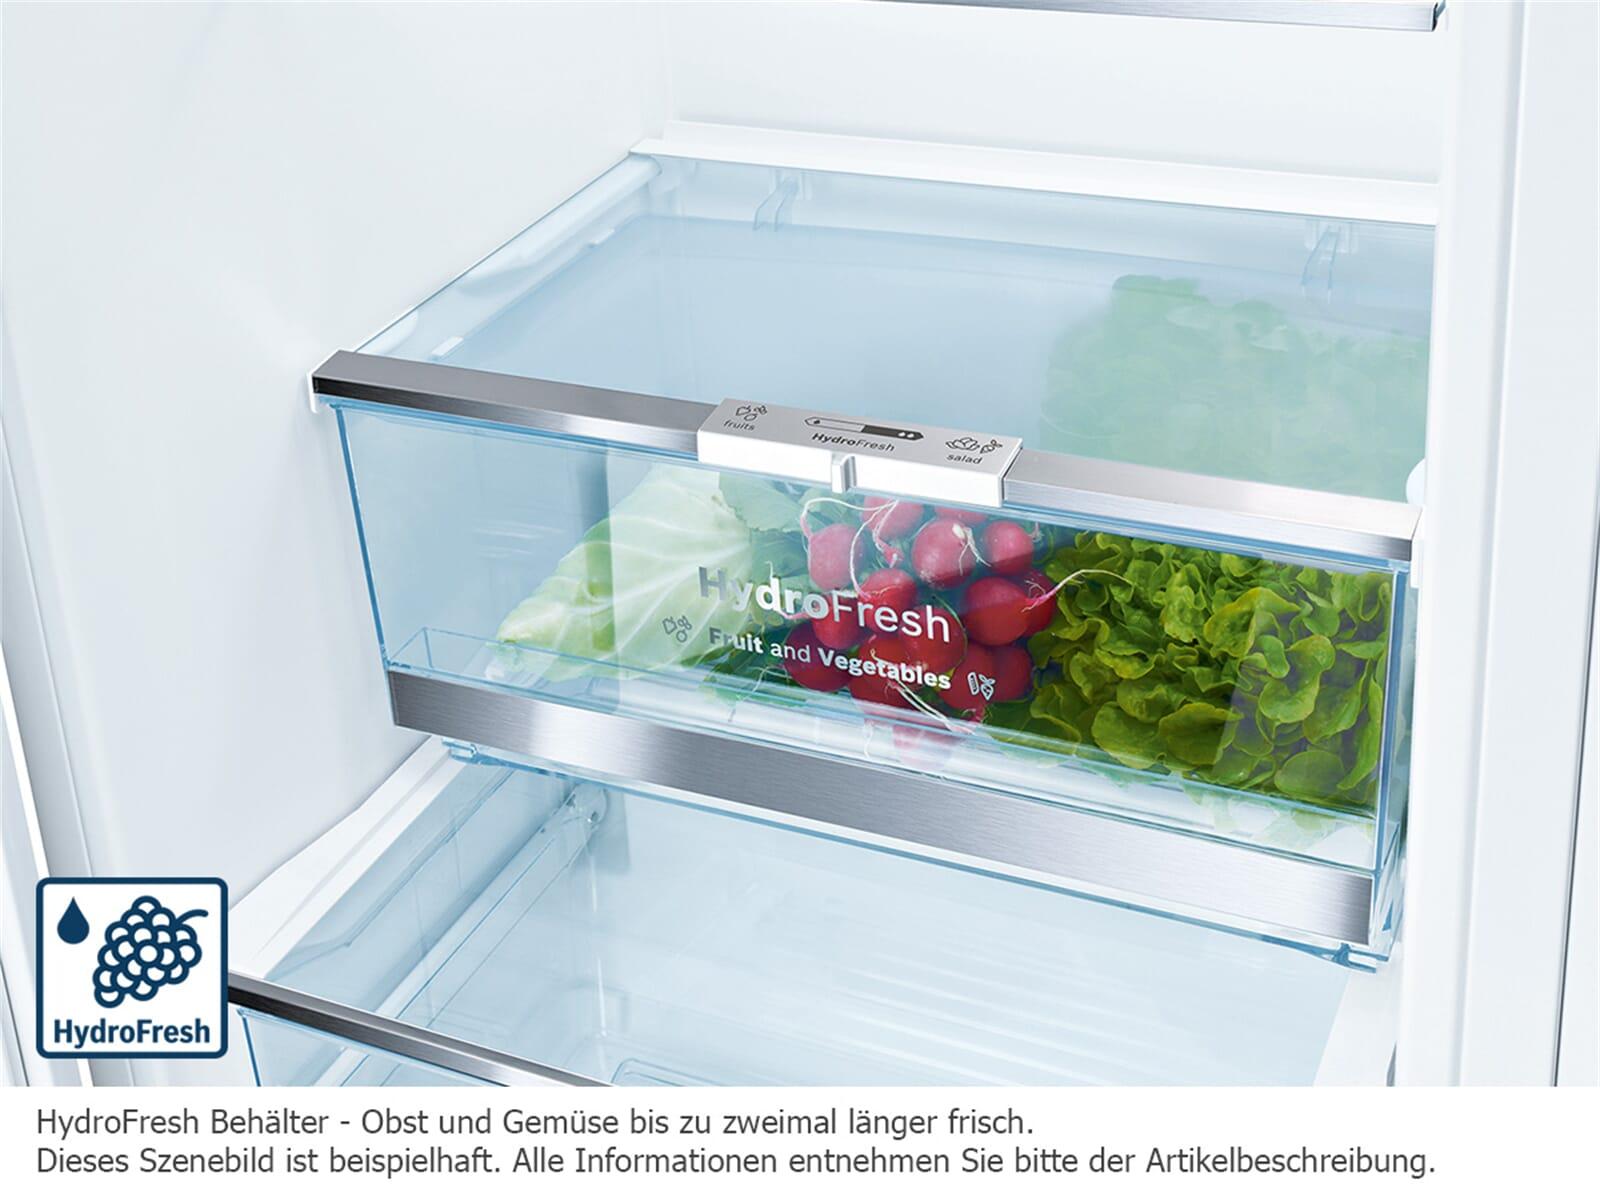 Bosch Kühlschrank Kgn 33 48 : Bosch hausgeräte l höffner